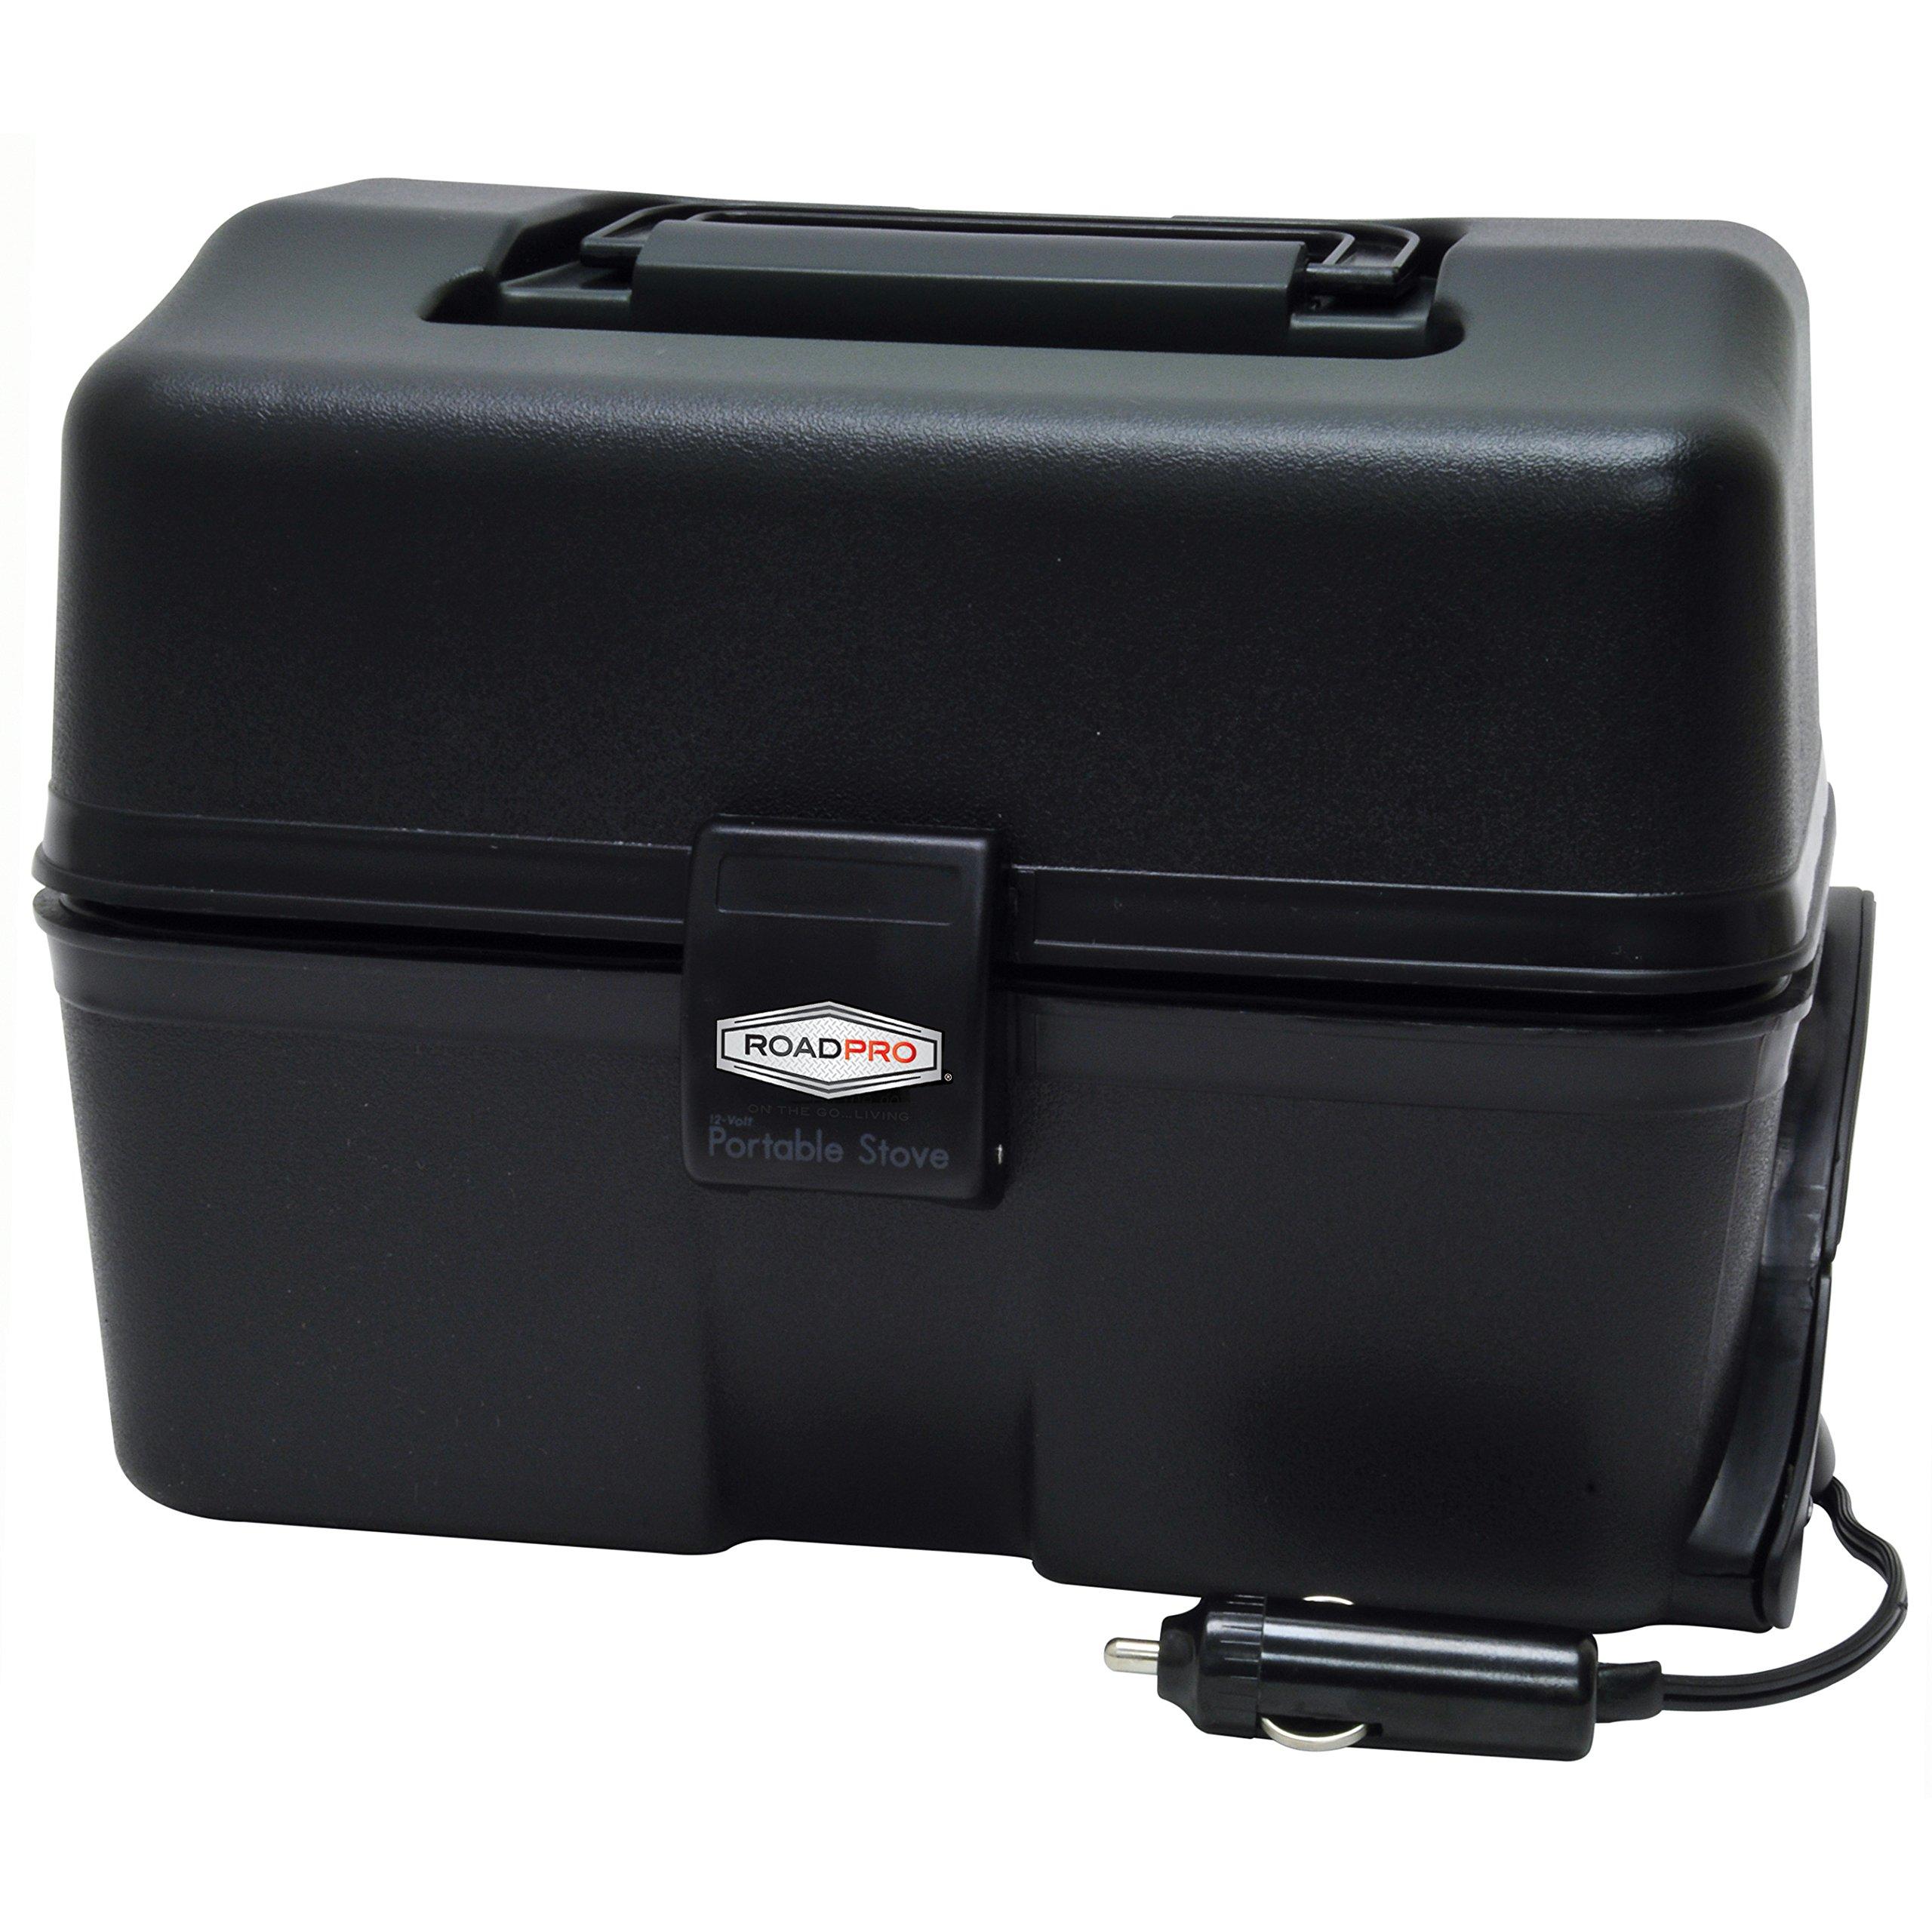 RoadPro 12-Volt Portable Stove, Black product image